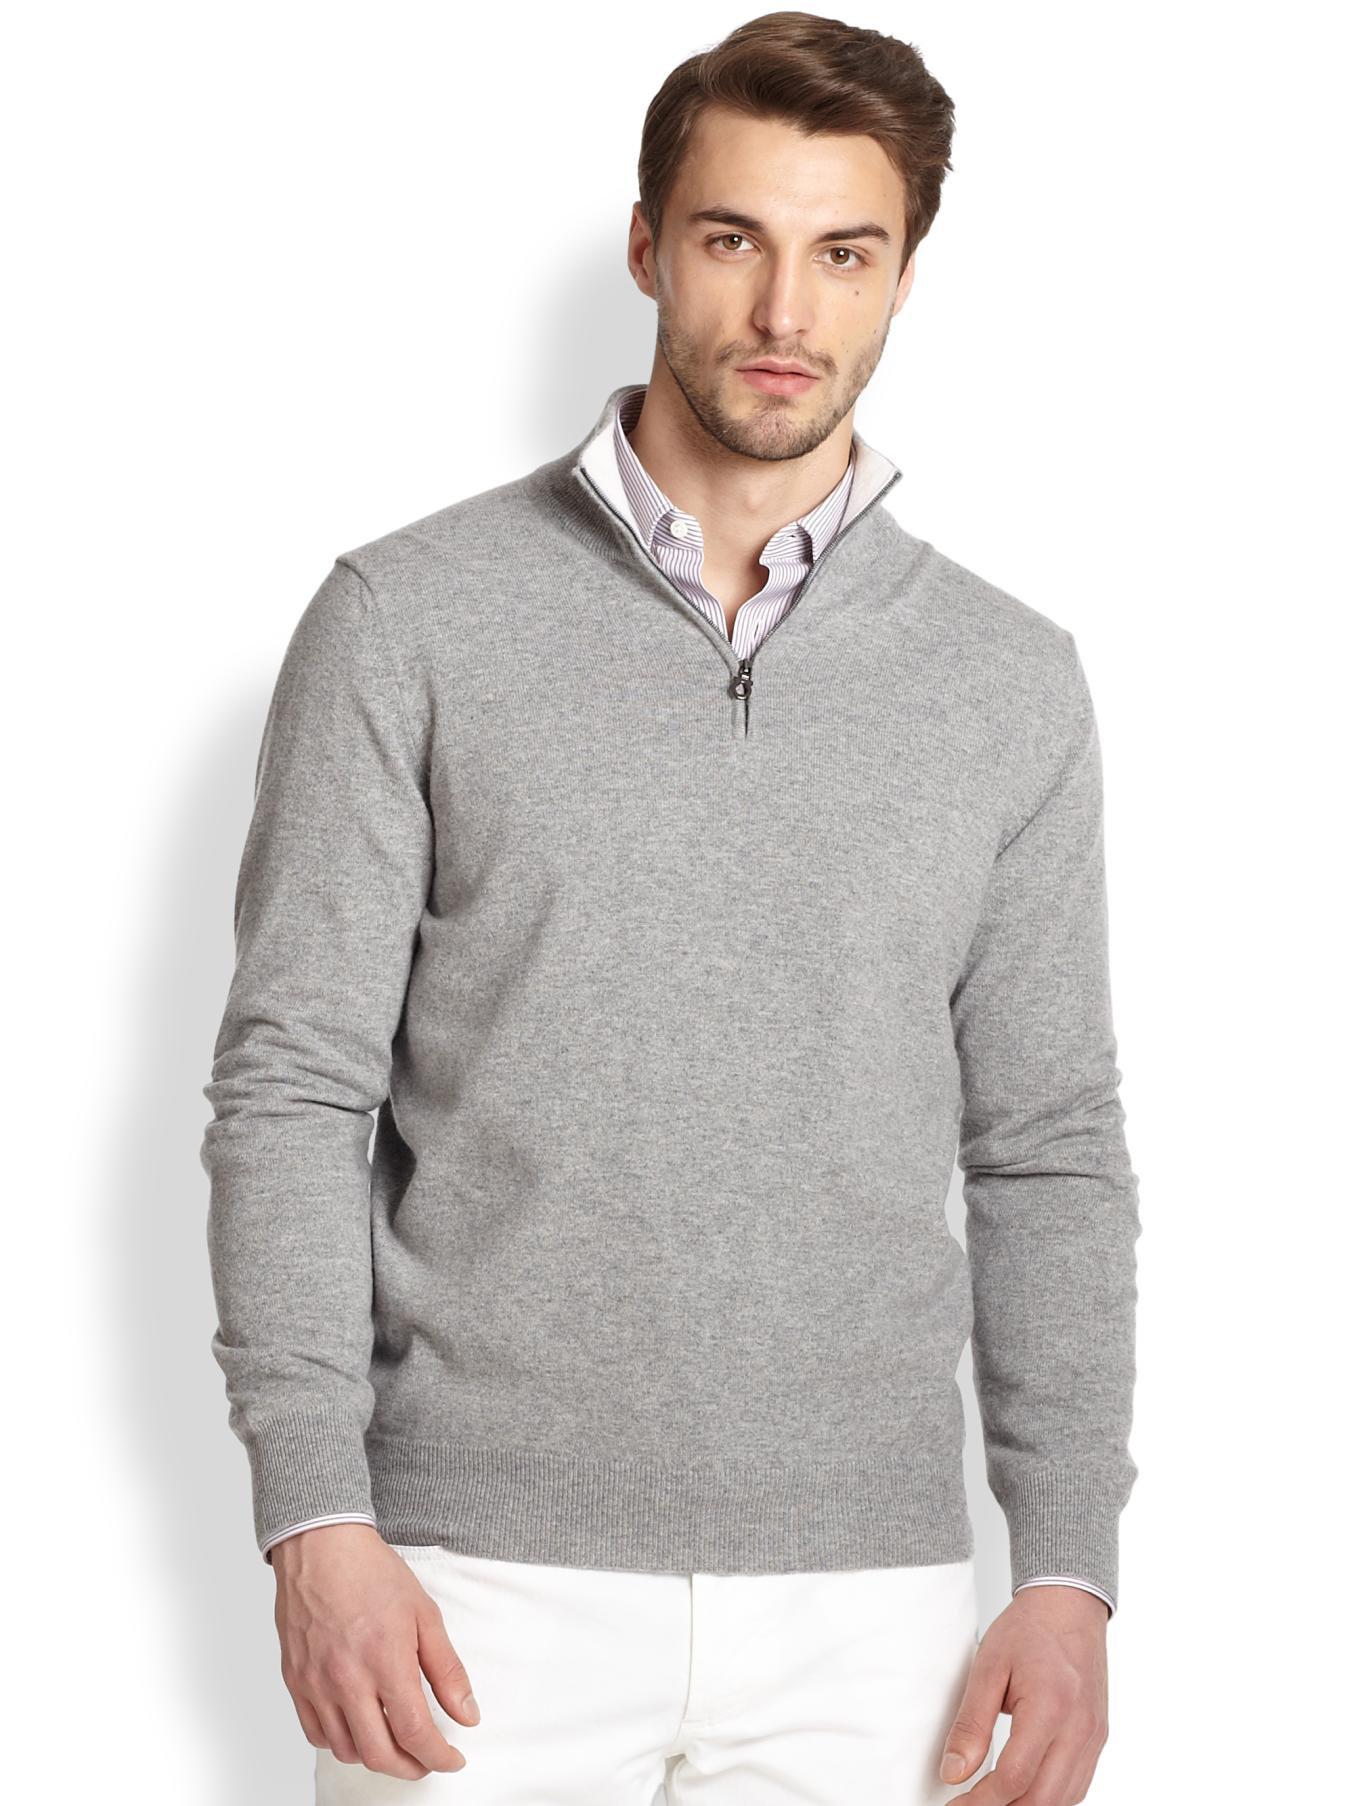 Ferragamo Cashmere Quarter-Zip Sweater in Gray for Men | Lyst